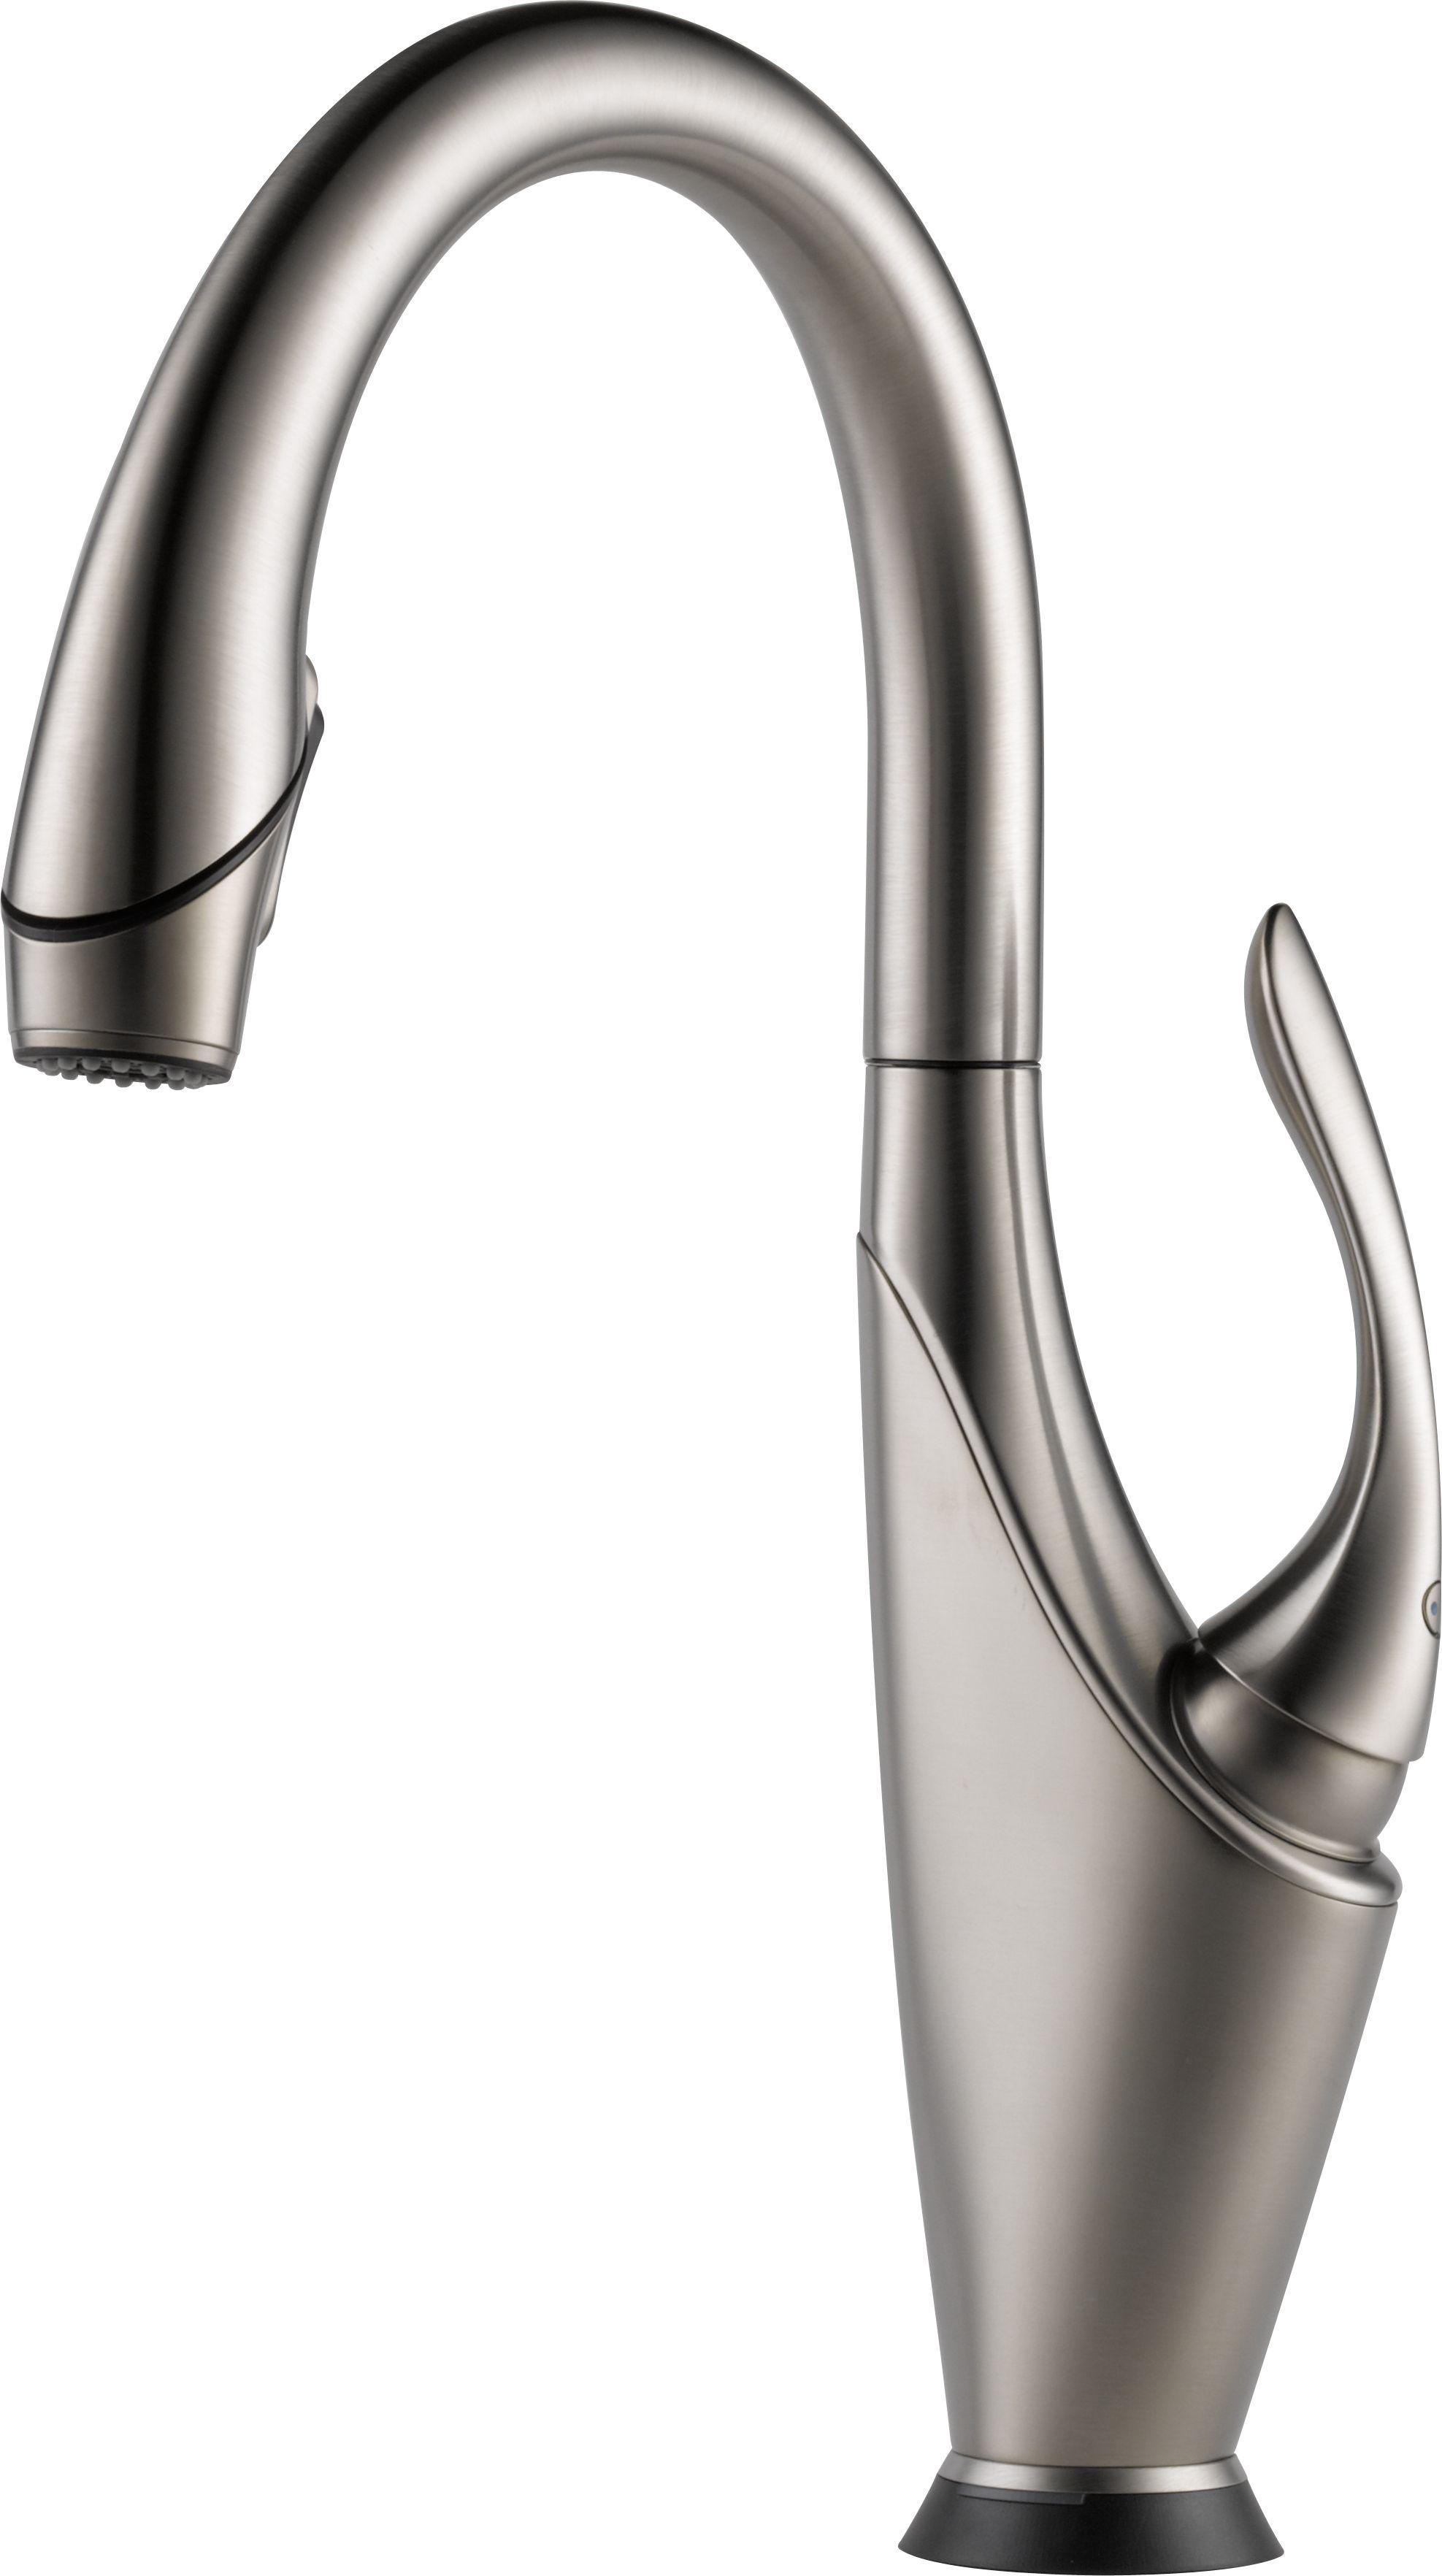 Brizo Vuelo Kitchen Faucet